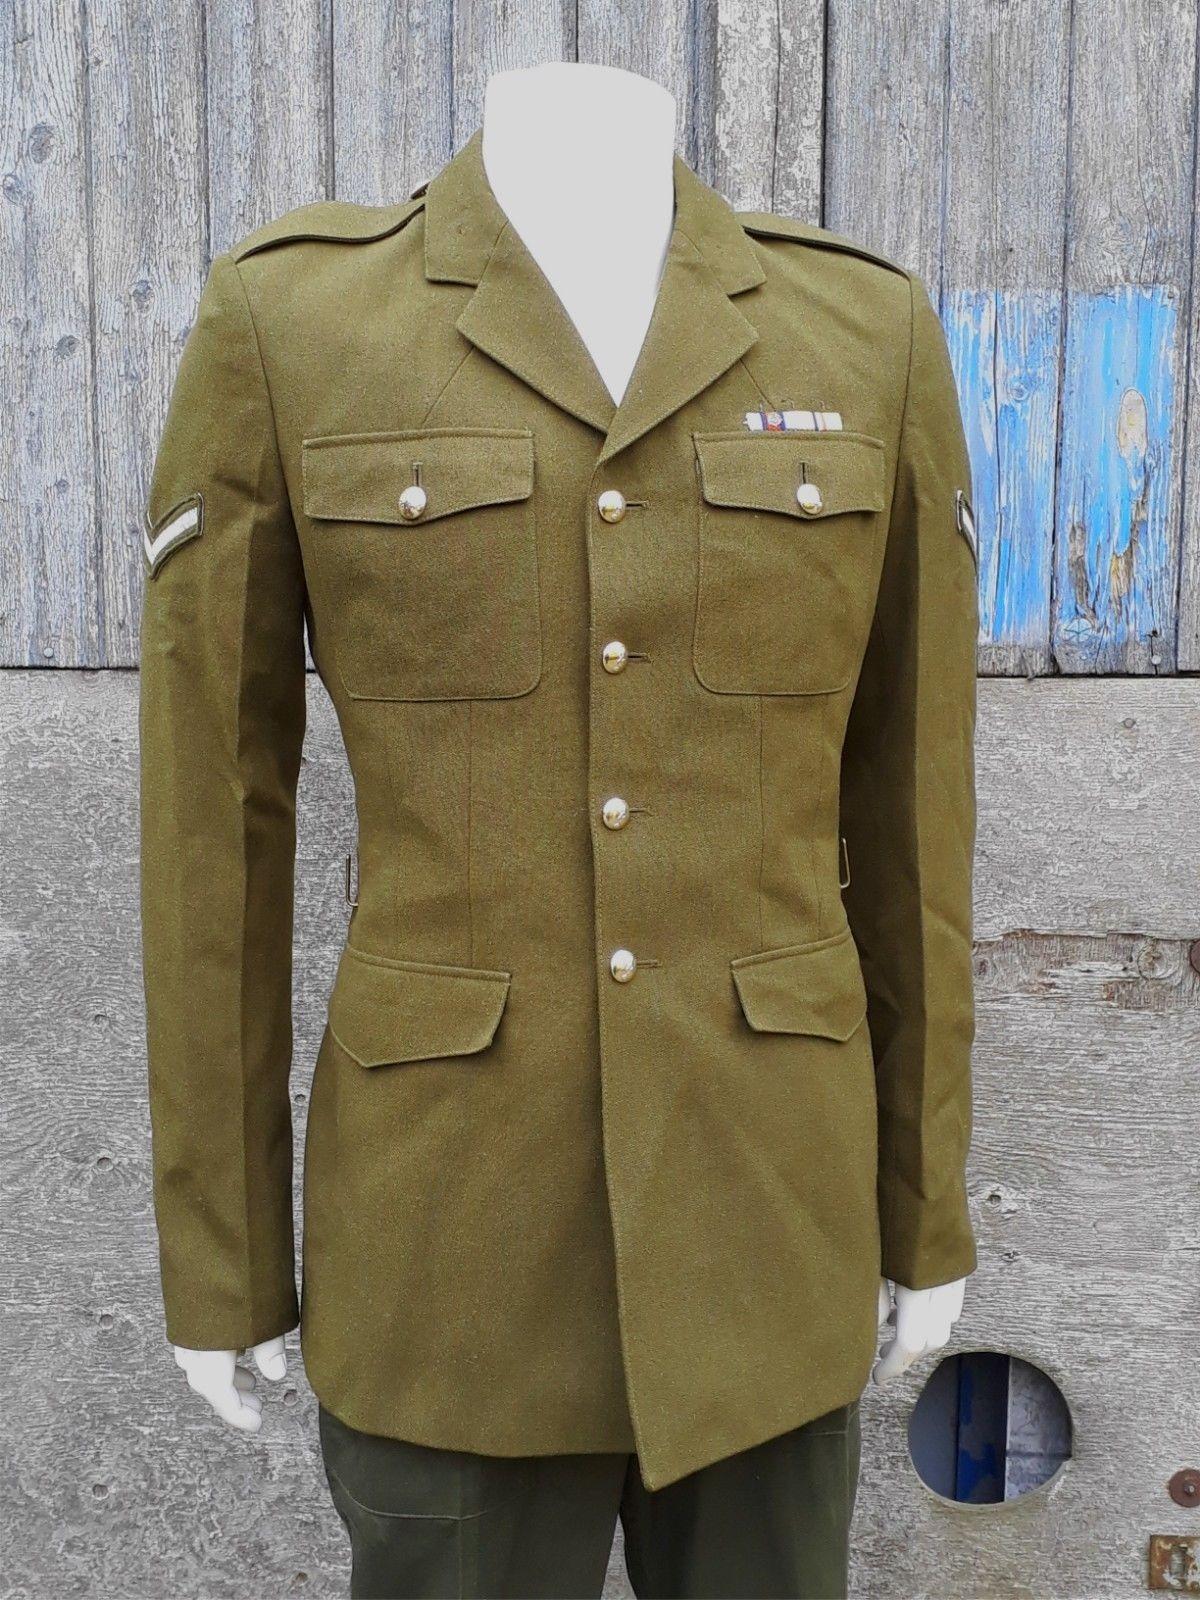 Suspenders Clip-On Black Milcom British Military Products